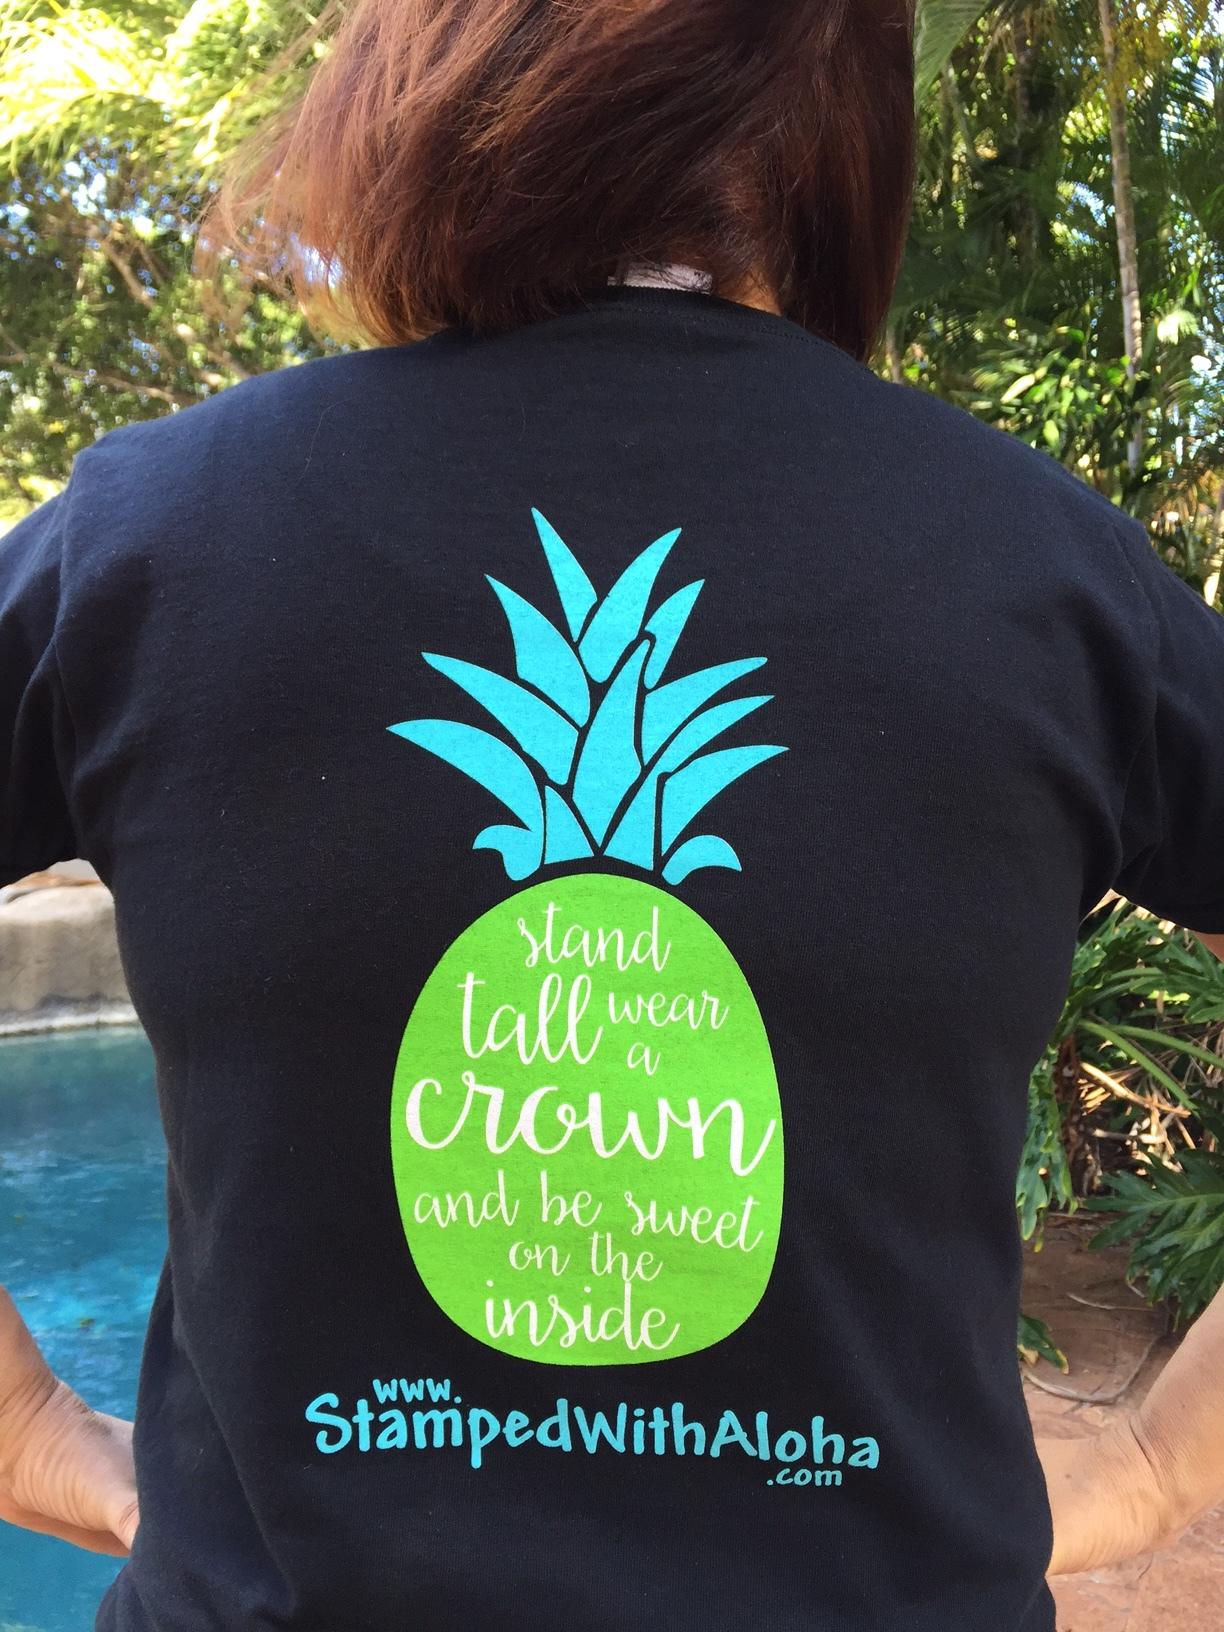 Be A Pineapple T-shirt (back) - www.stampedwithaloha.com